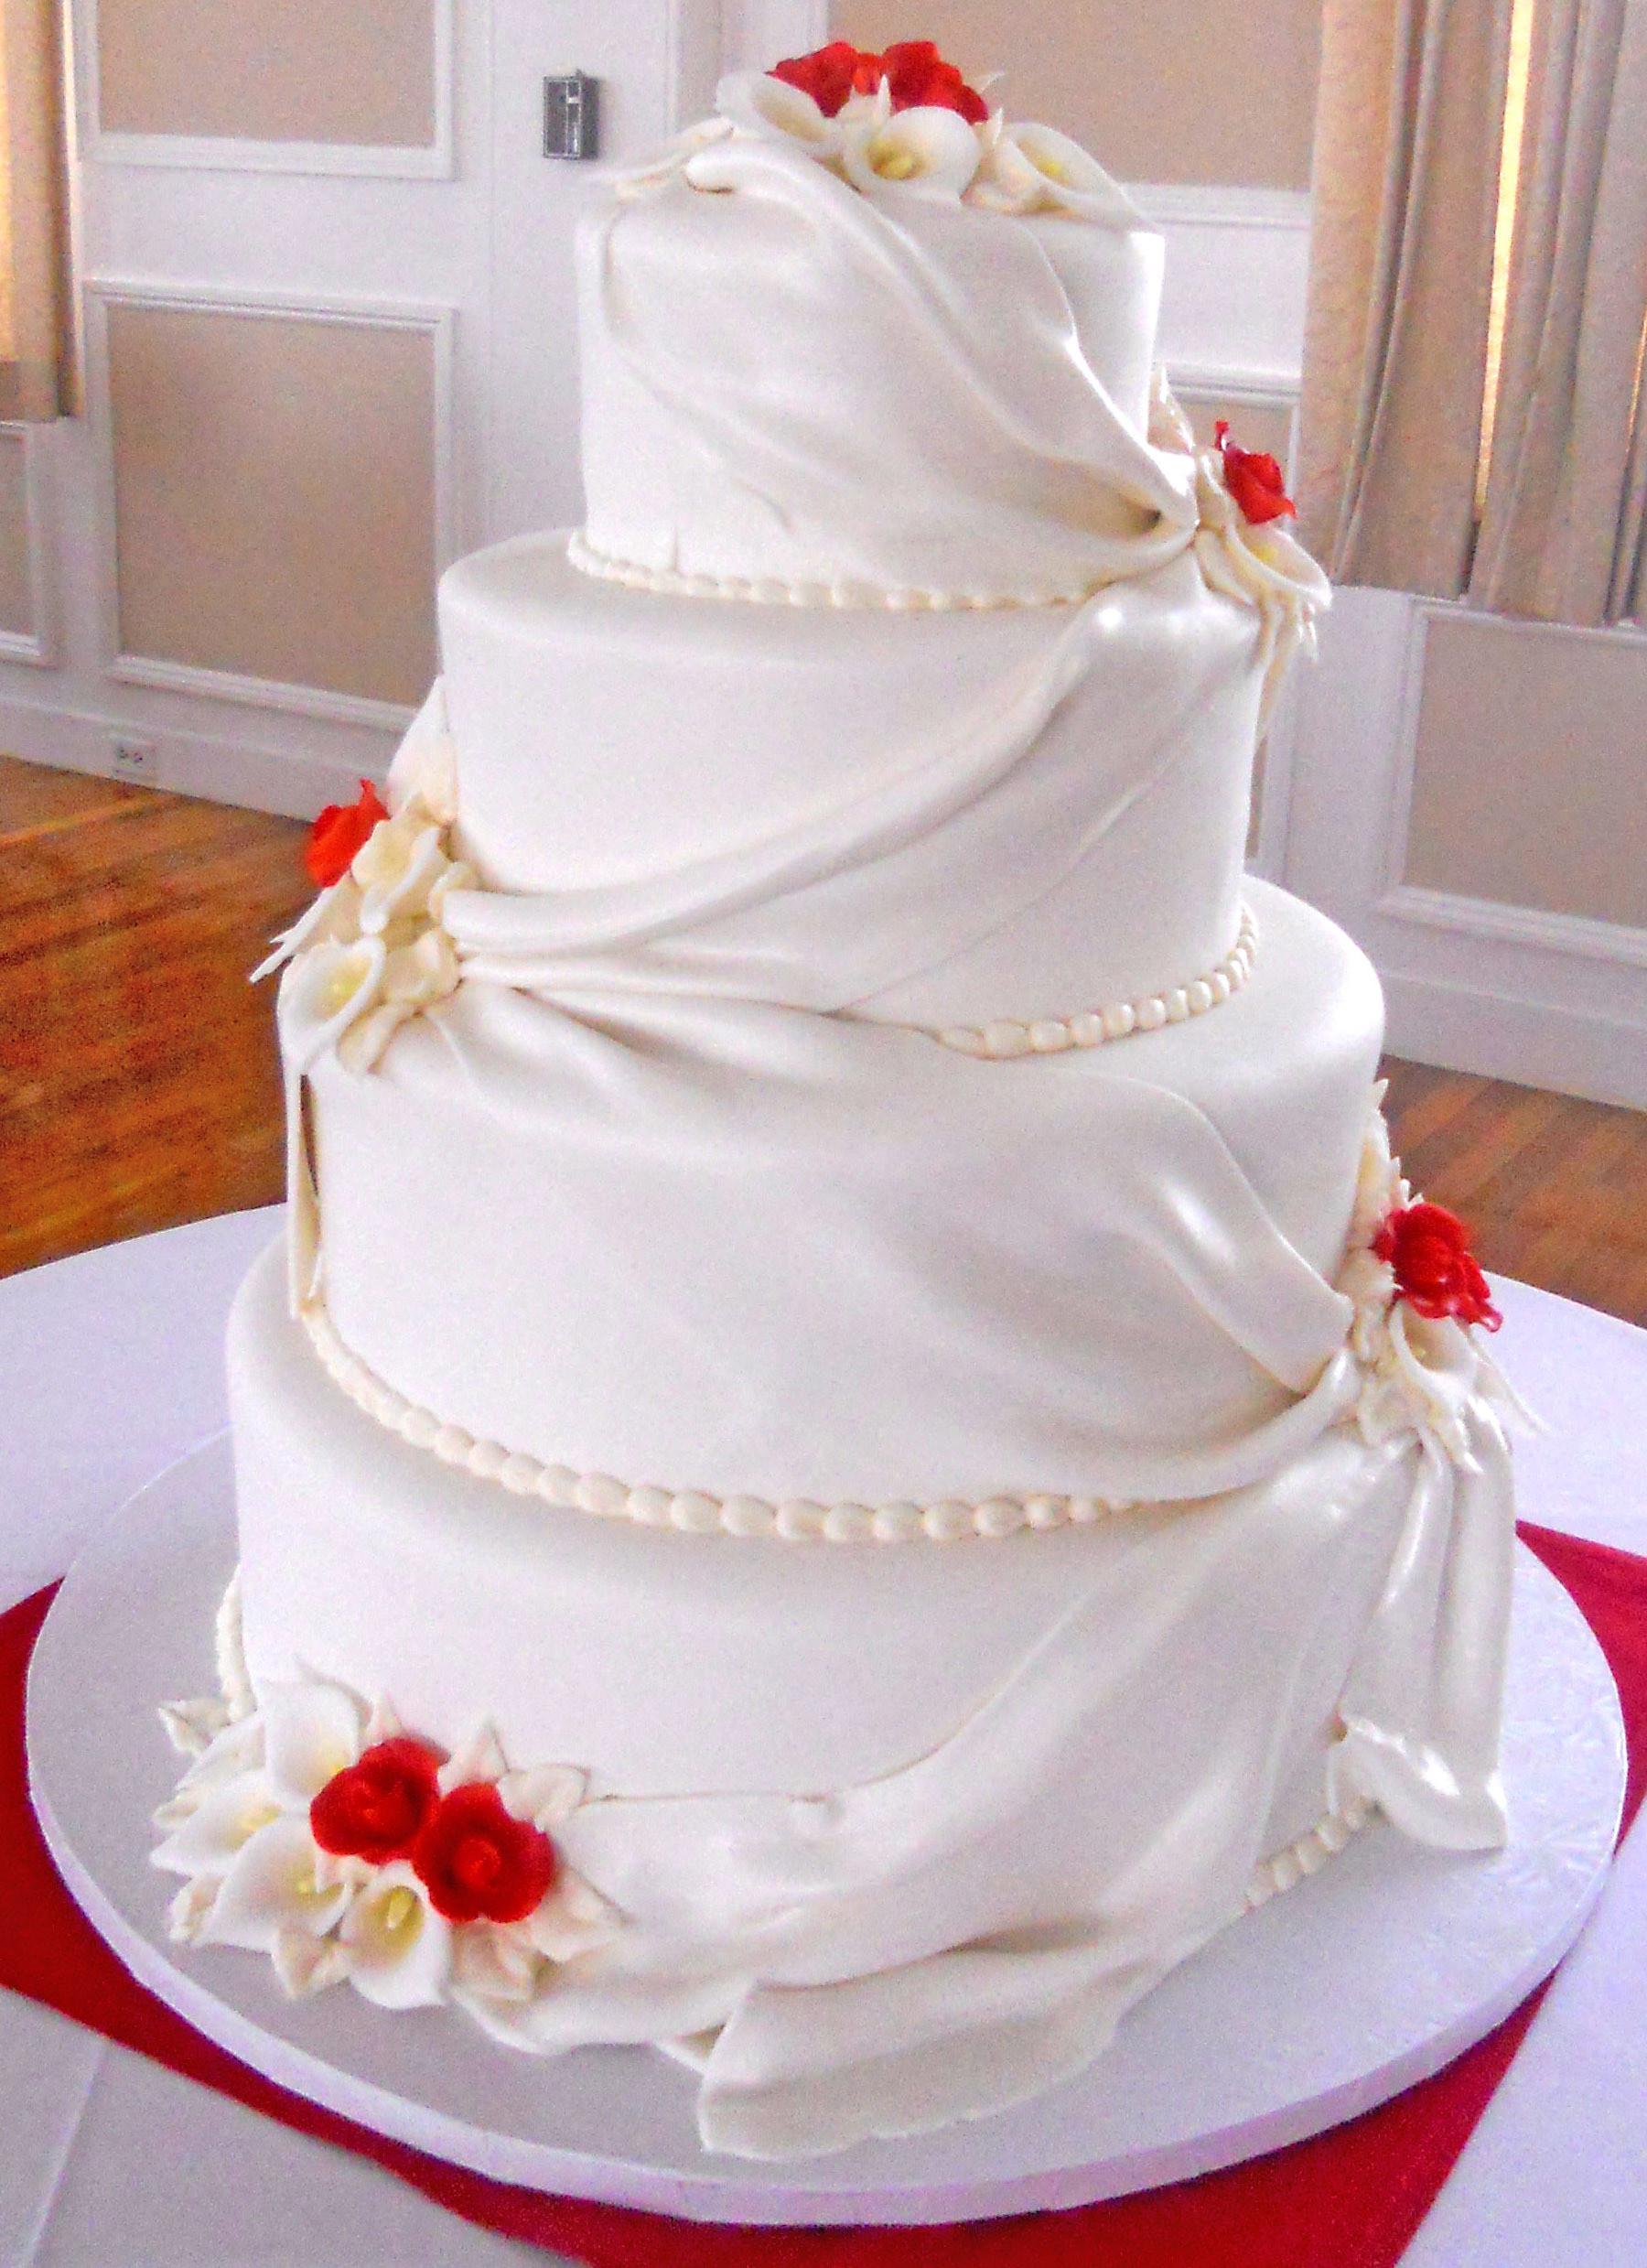 I Do Wedding Cakes  Wedding Cakes Idea Wallpapers